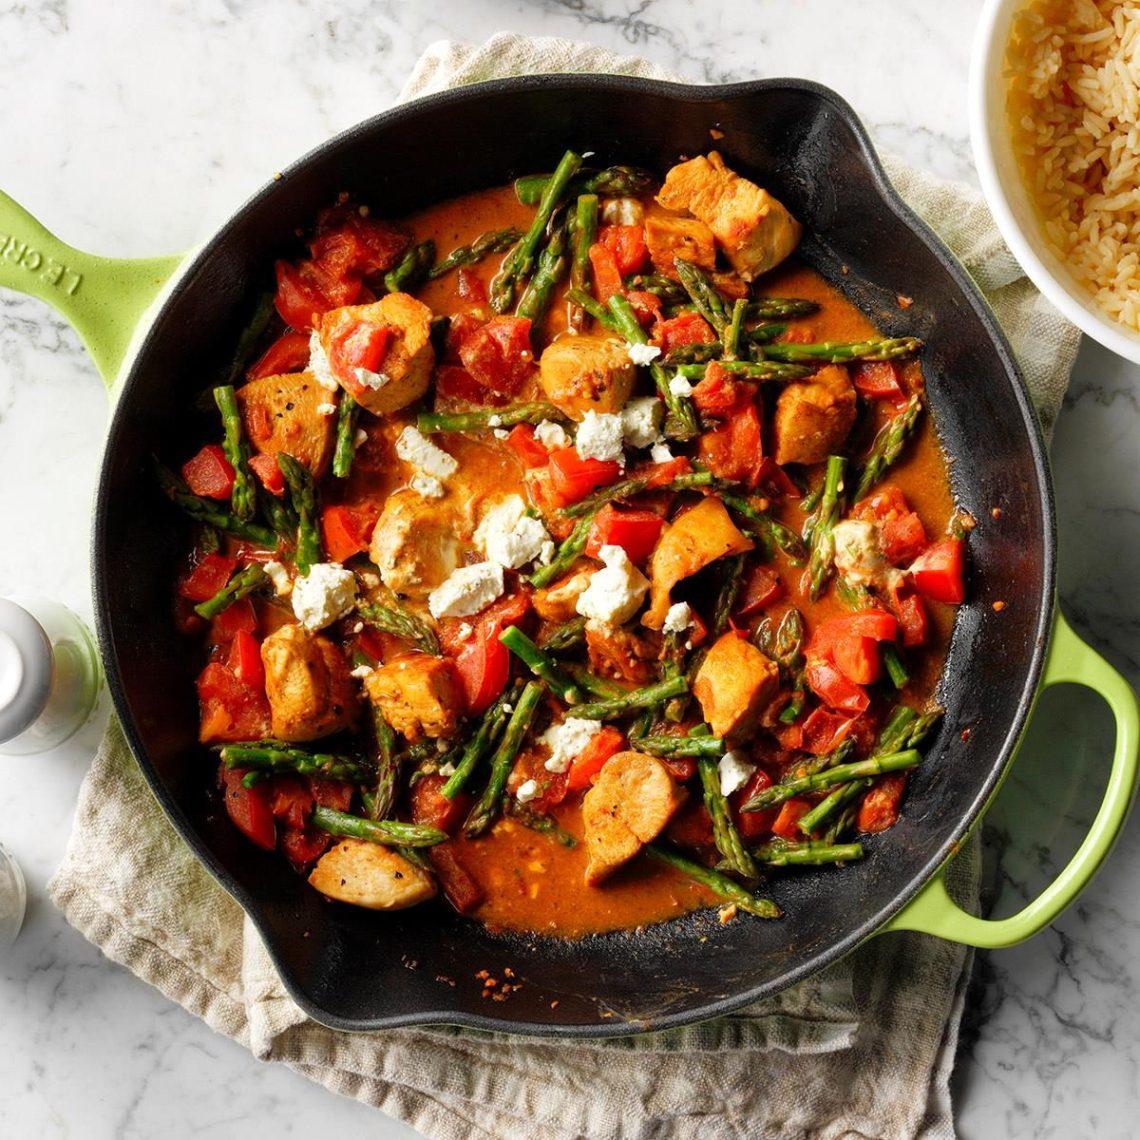 Chicken & Goat Cheese Skillet Recipe | Taste of Home